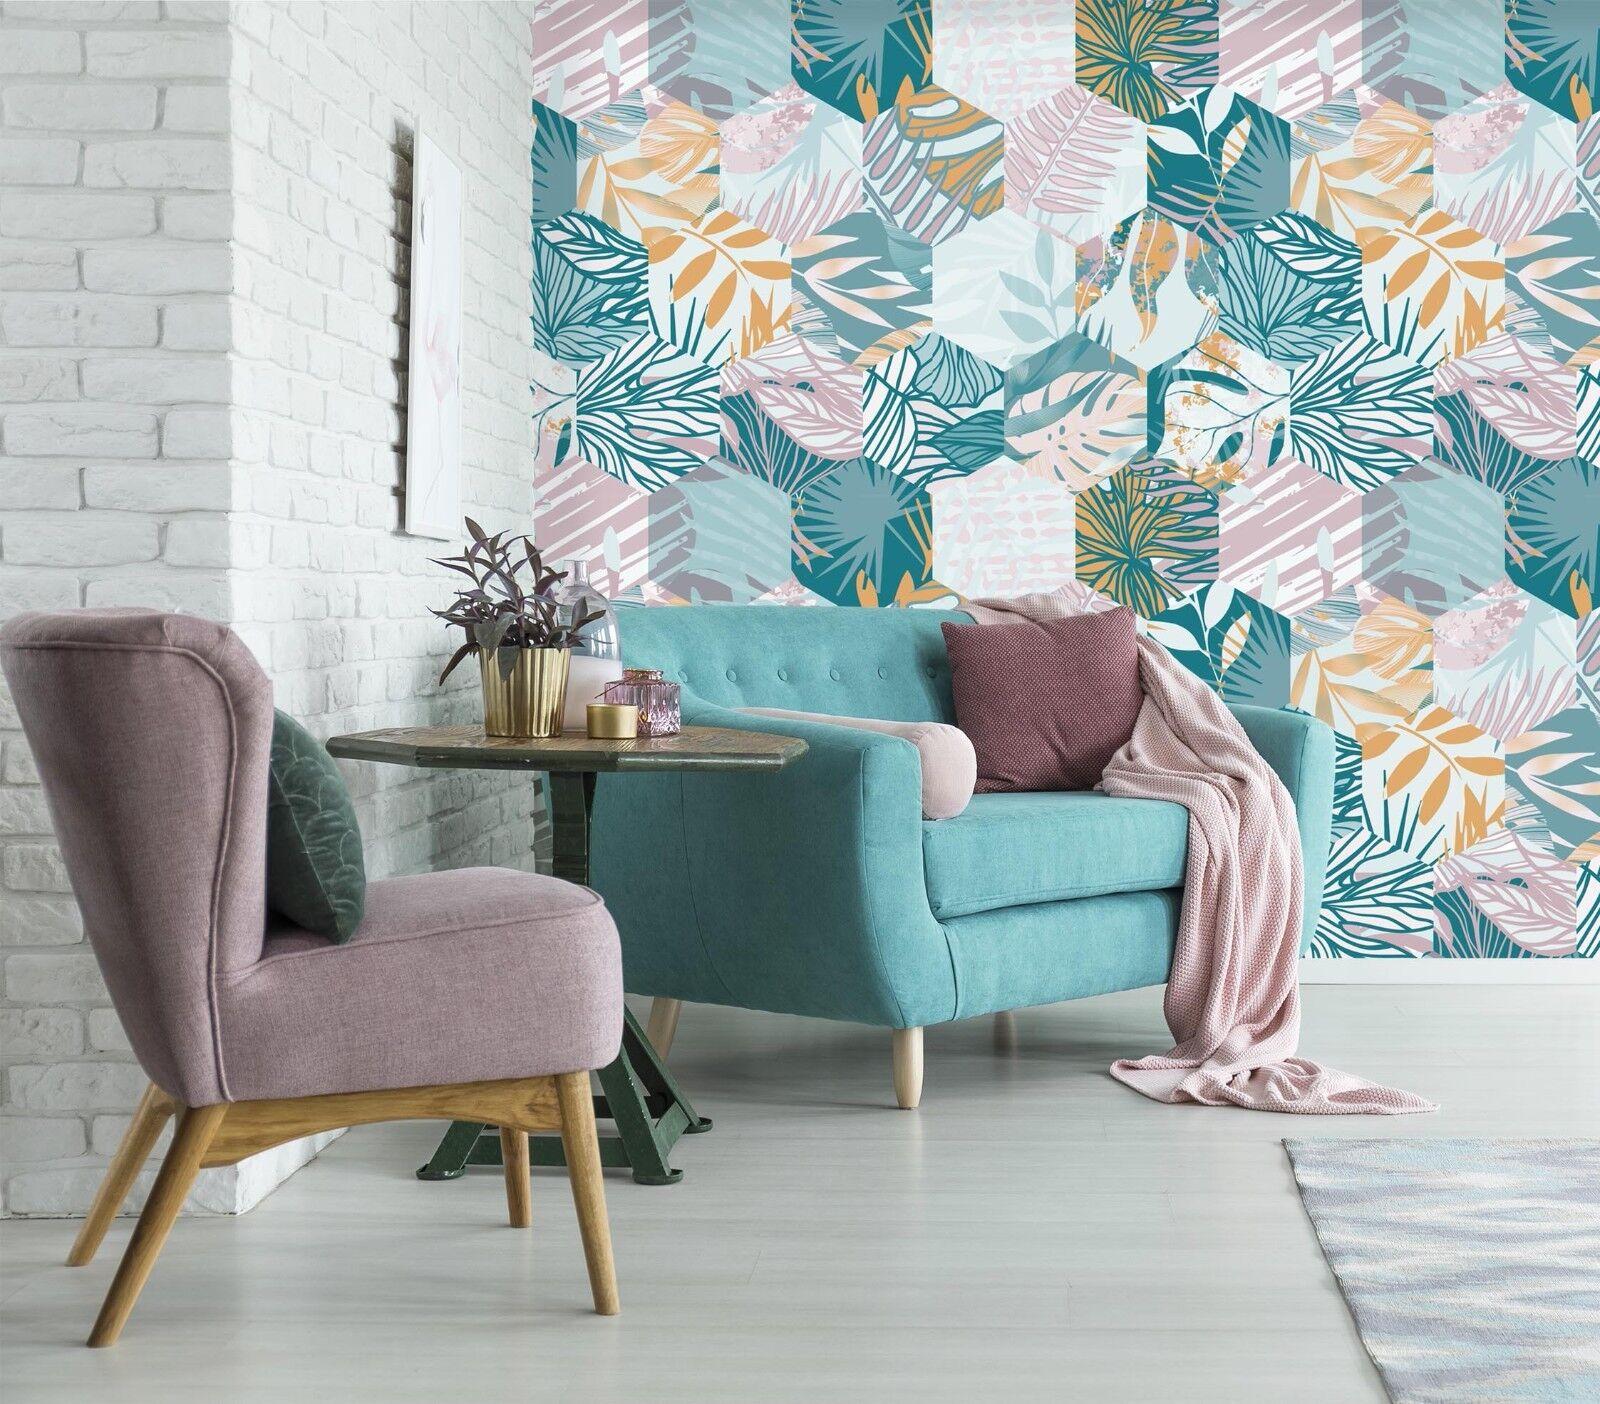 3D Simple Leaf Pattern 784 Wallpaper Mural Paper Wall Print Murals UK Summer